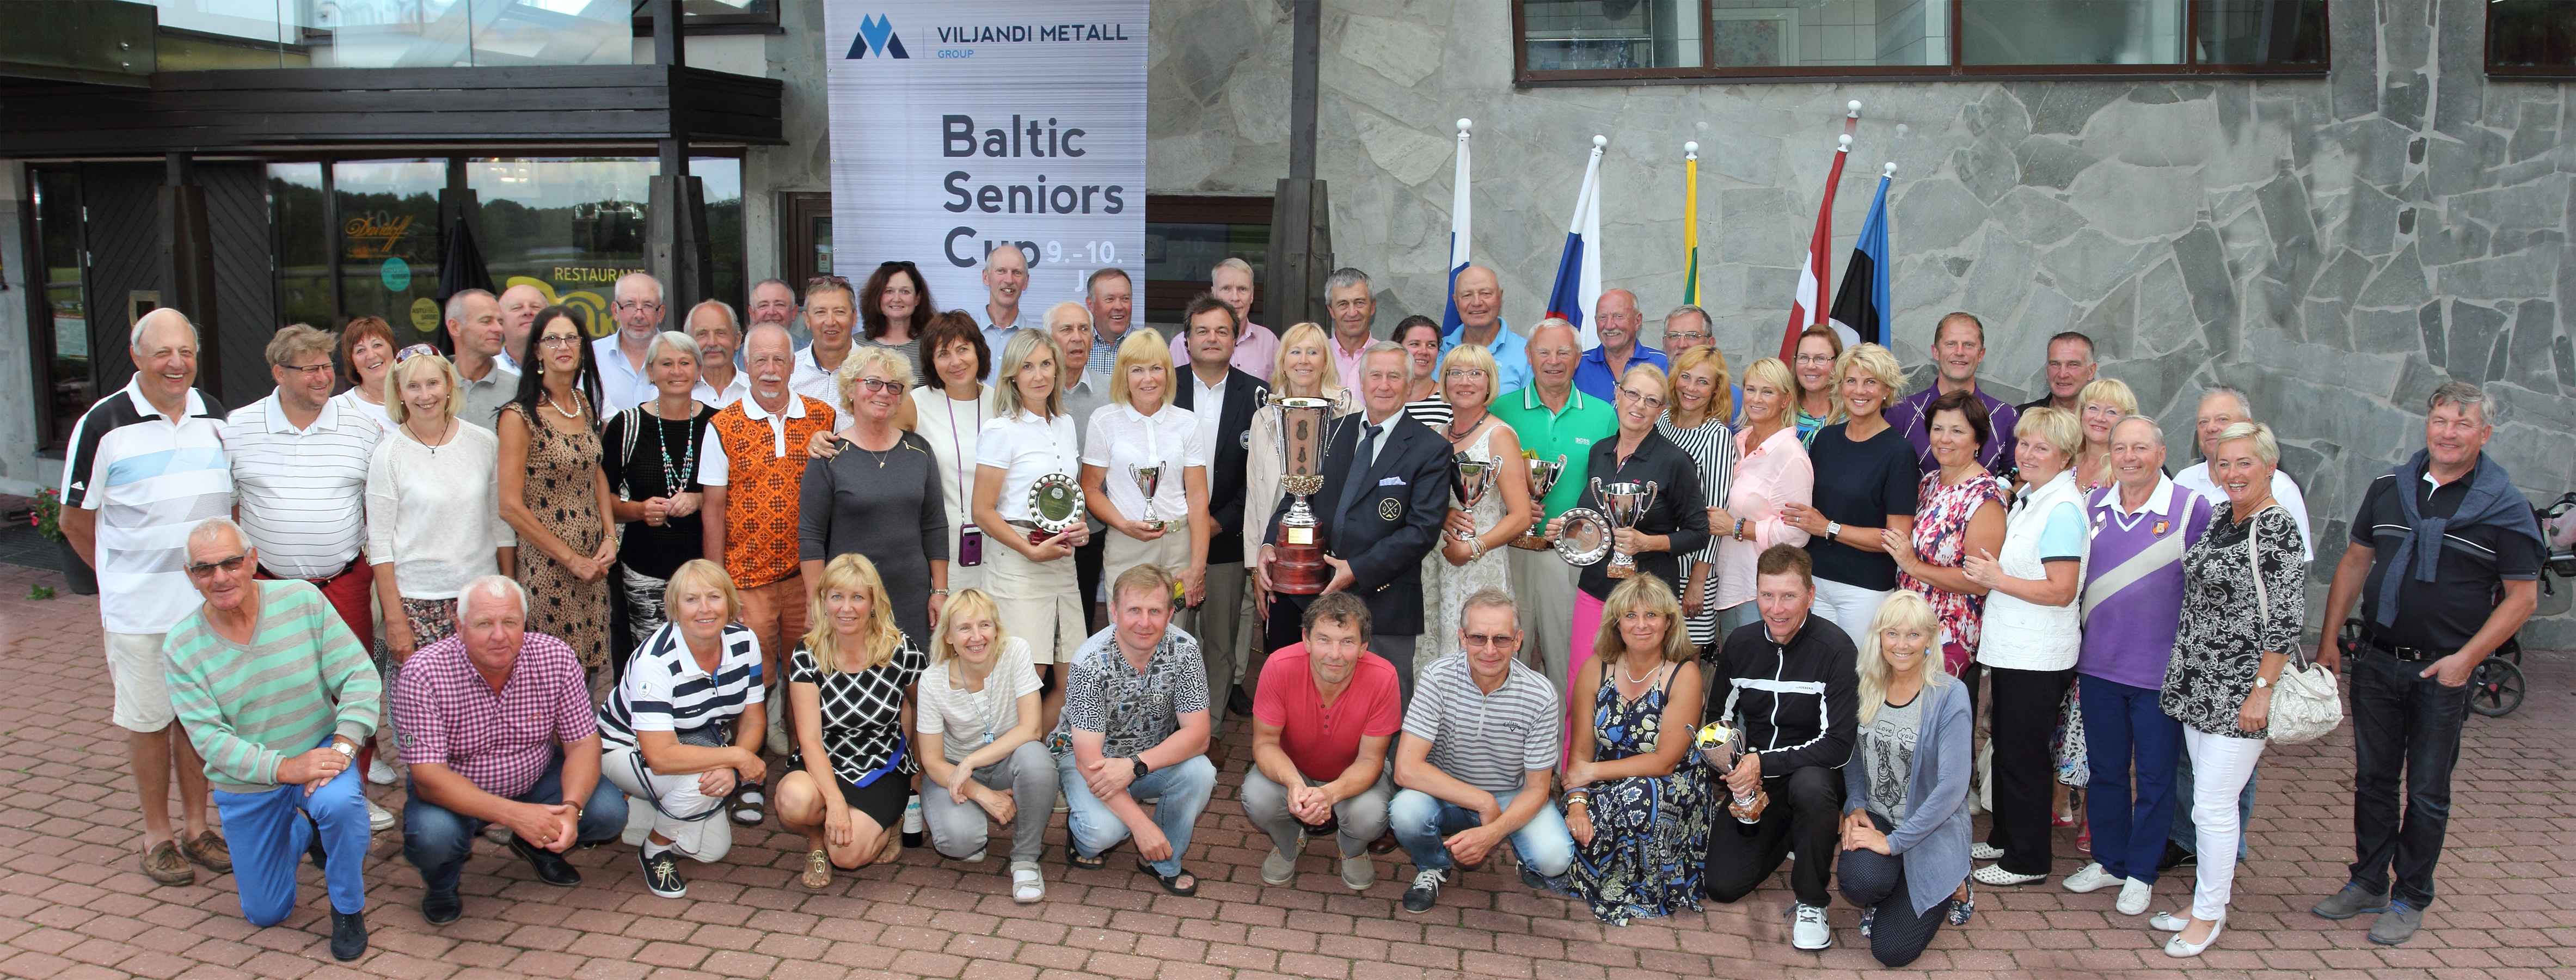 Baltic-Seniors-Cup-2016-Otepää